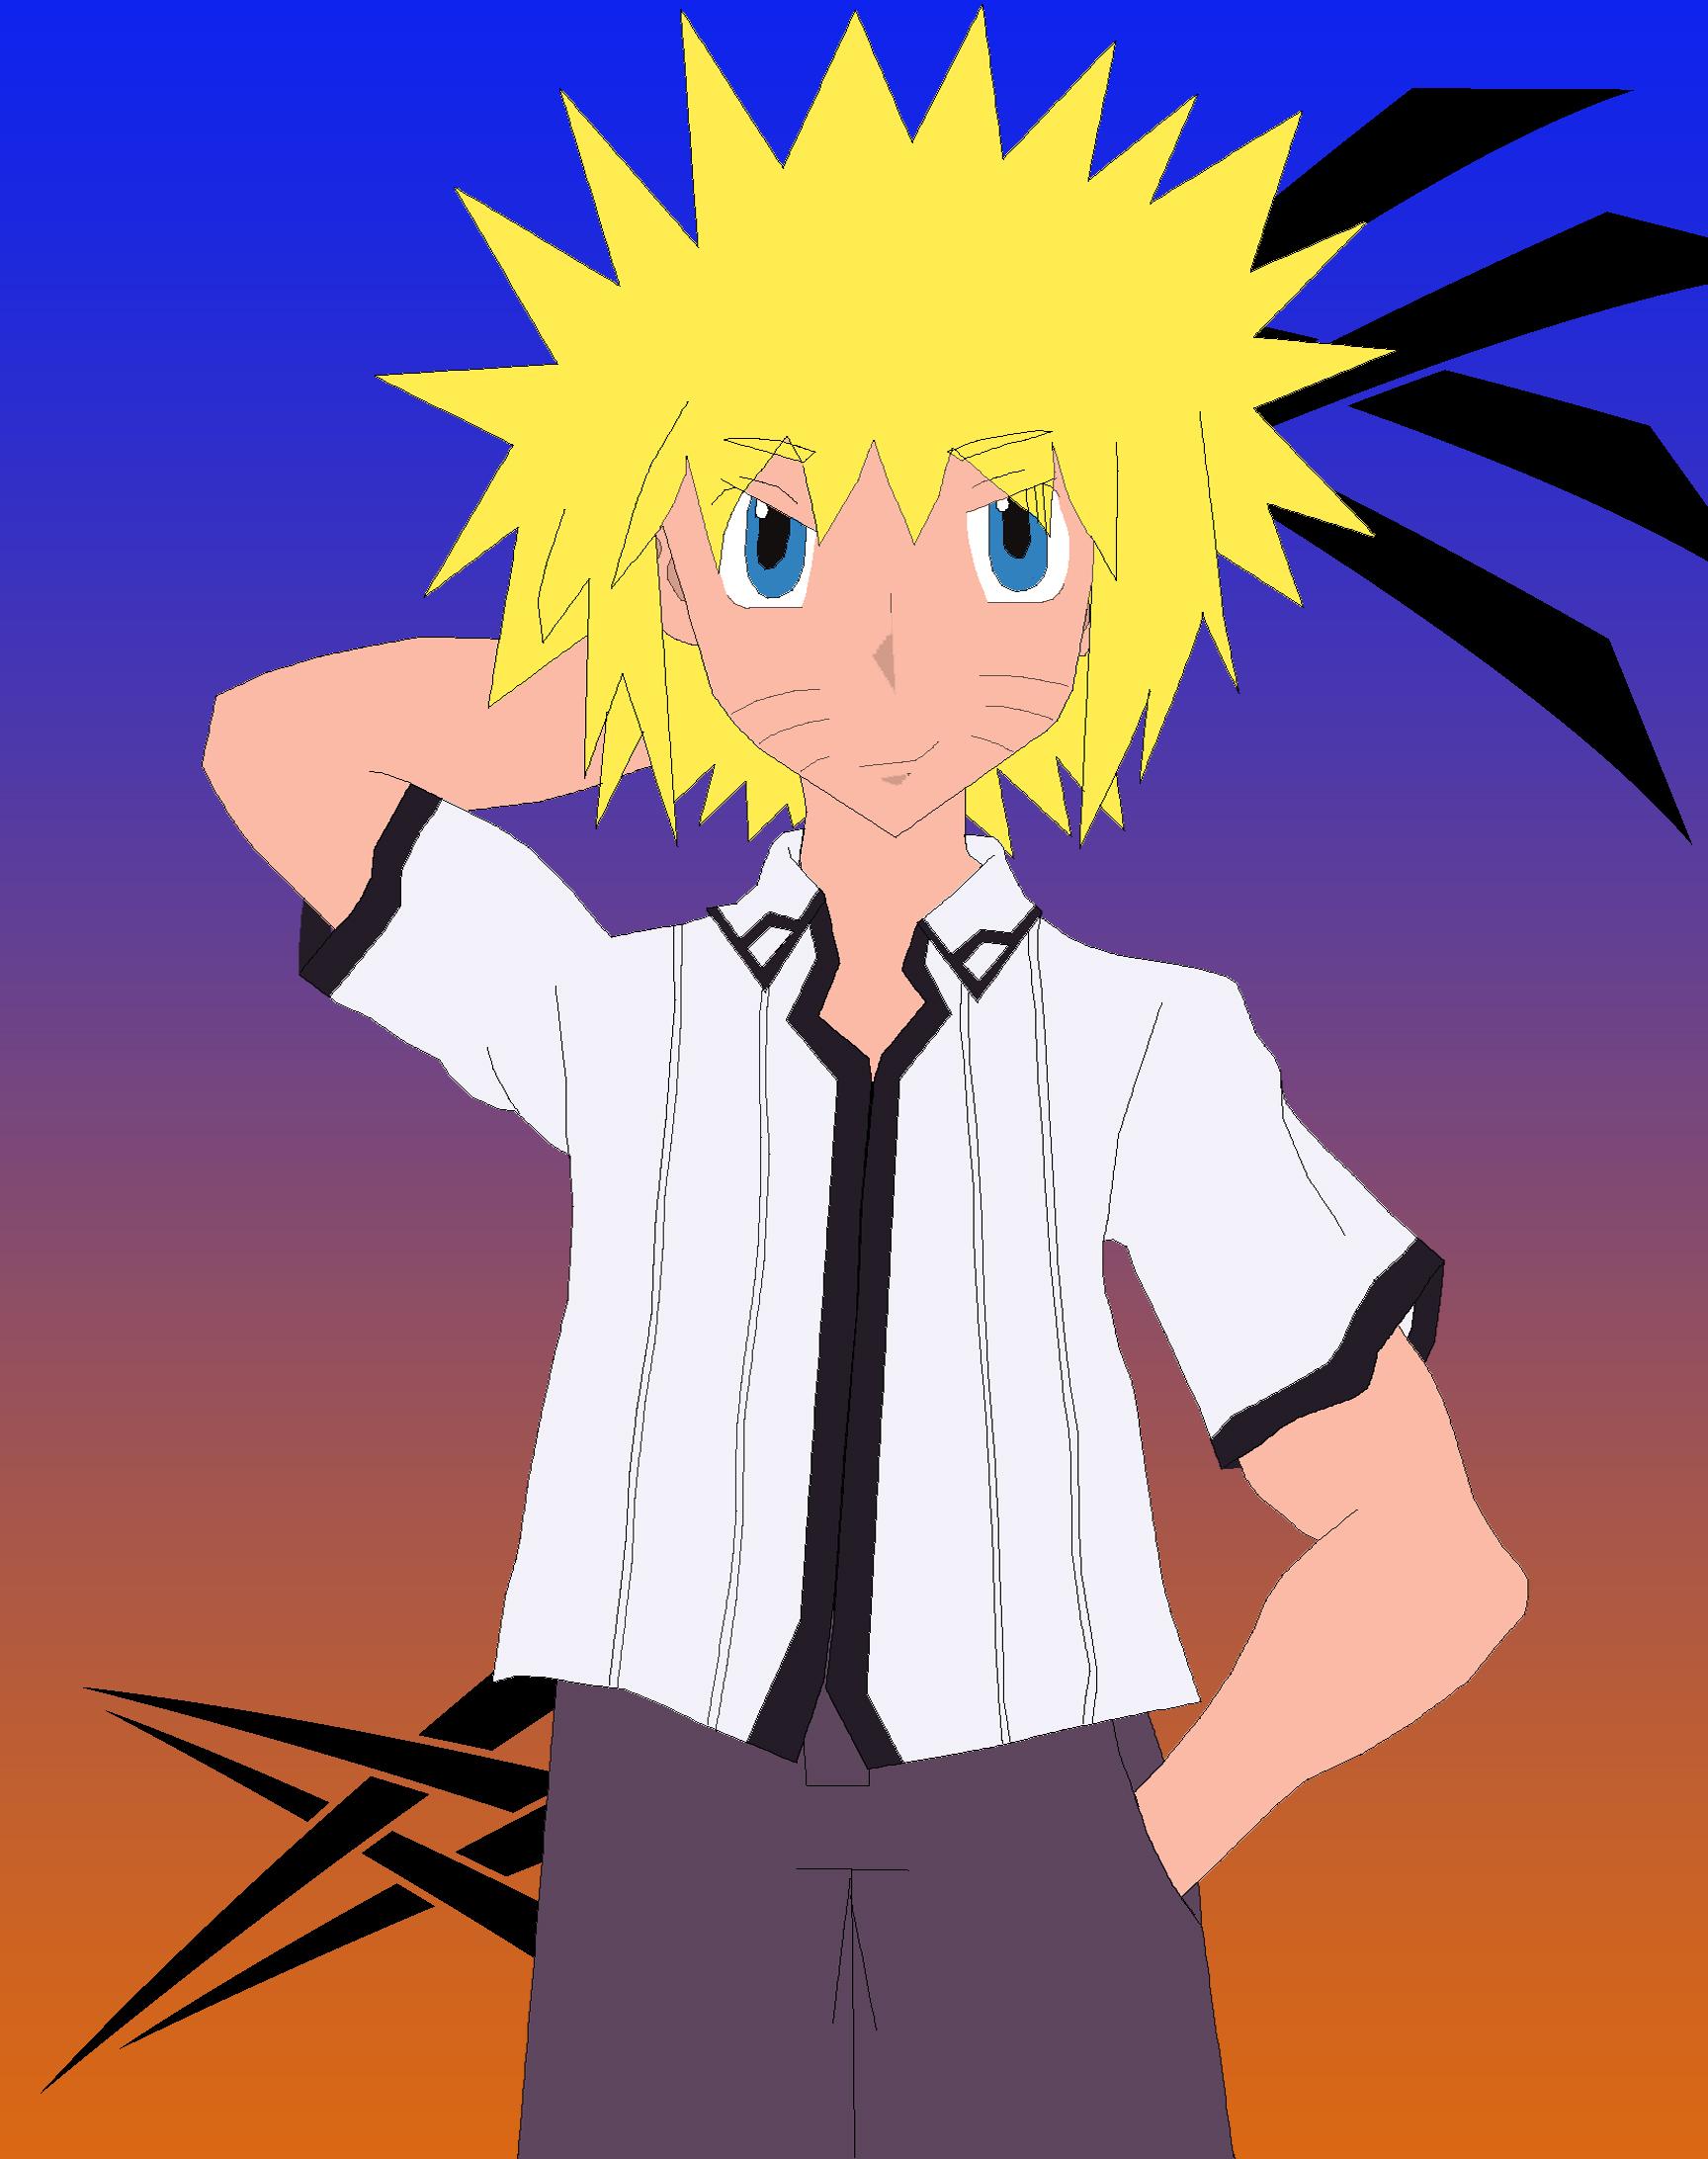 Naruto Yokai Dxd Fanfic Related Keywords & Suggestions - Naruto